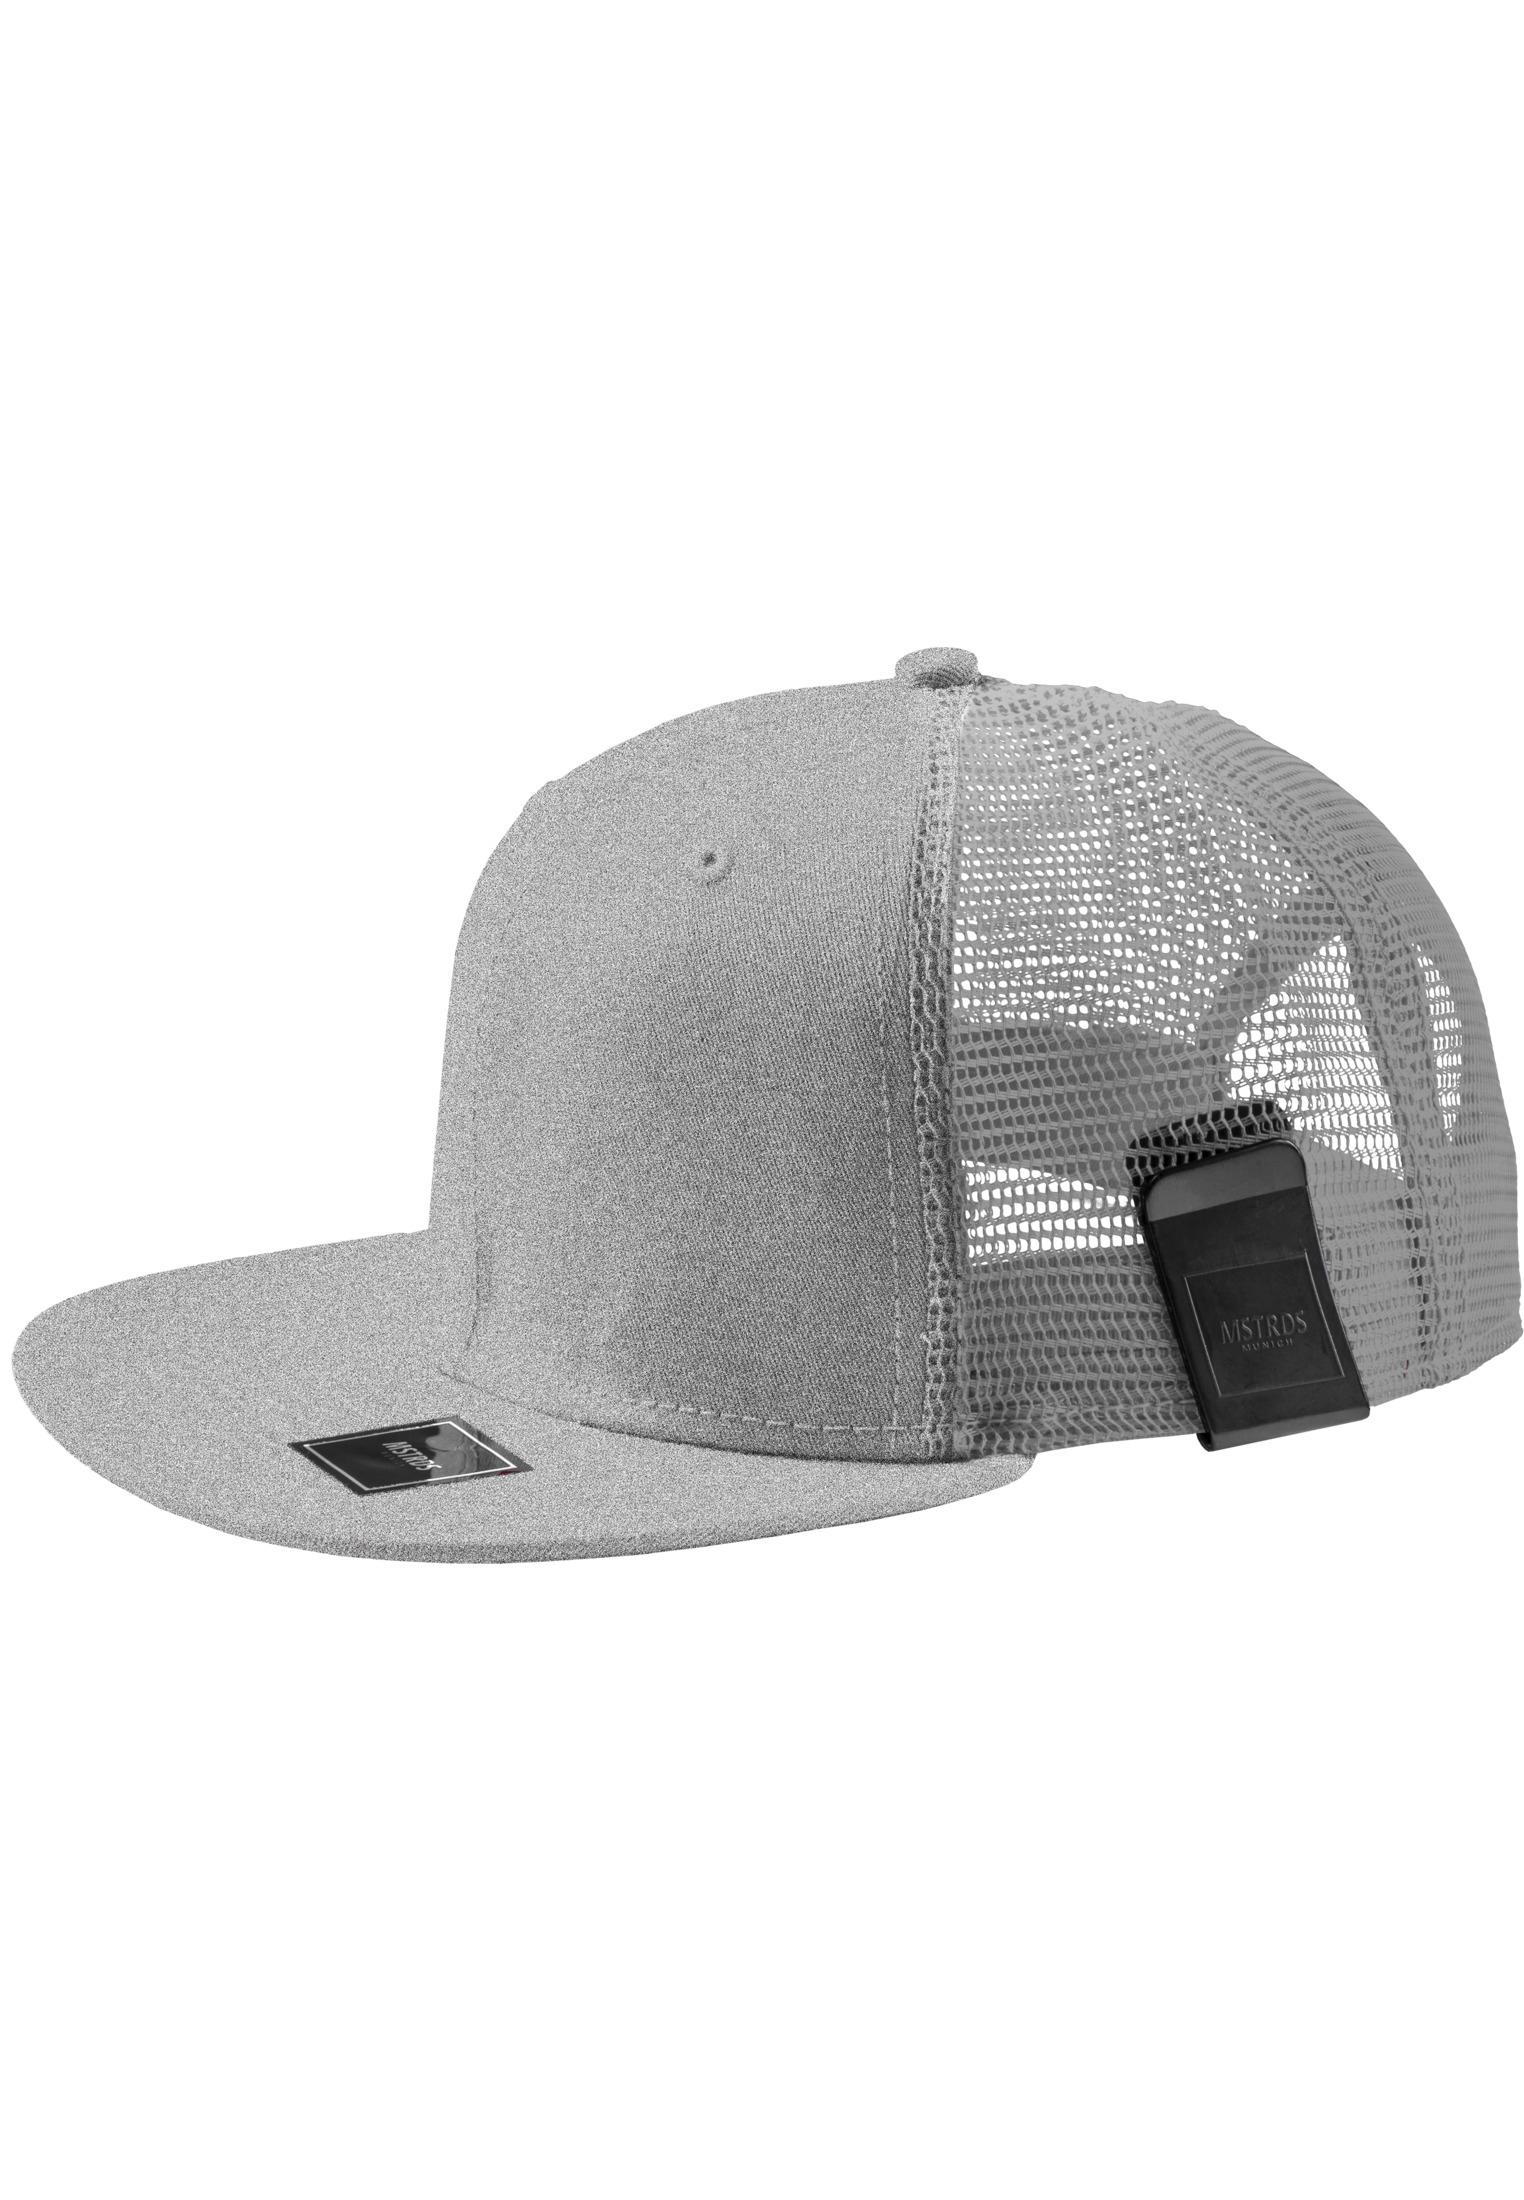 Master Dis MoneyClip Trucker Snapback Cap h.grey - One Size